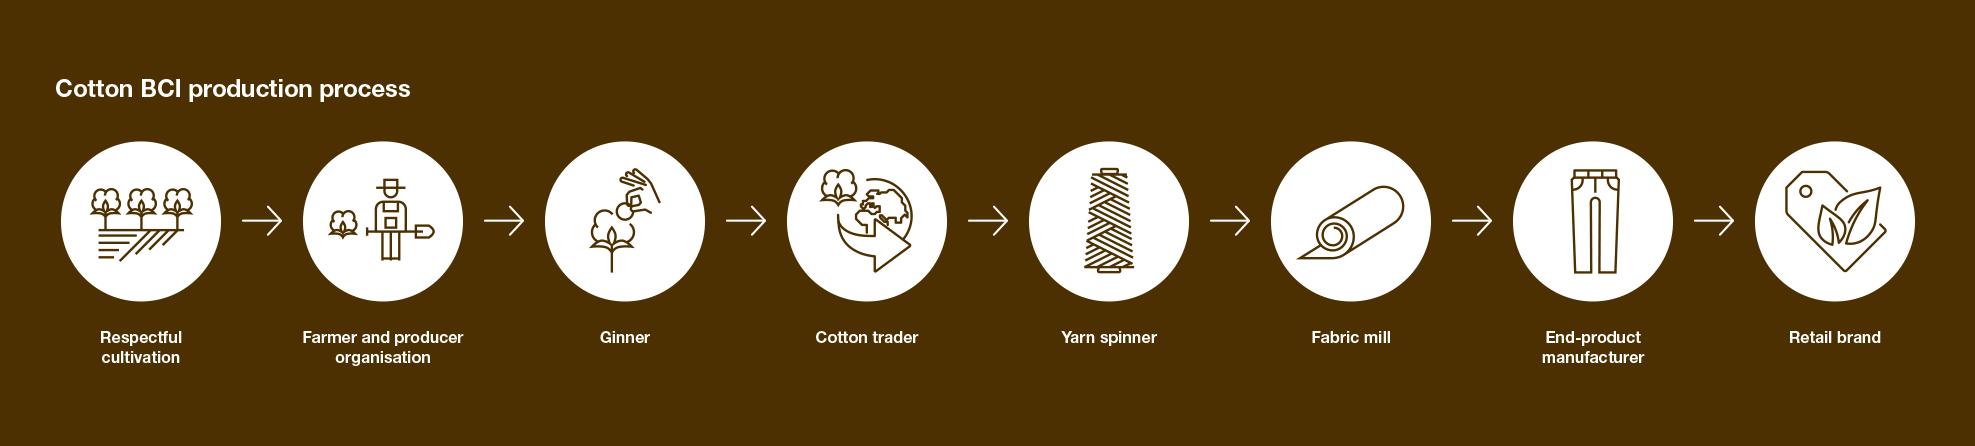 seaqual yarn production process